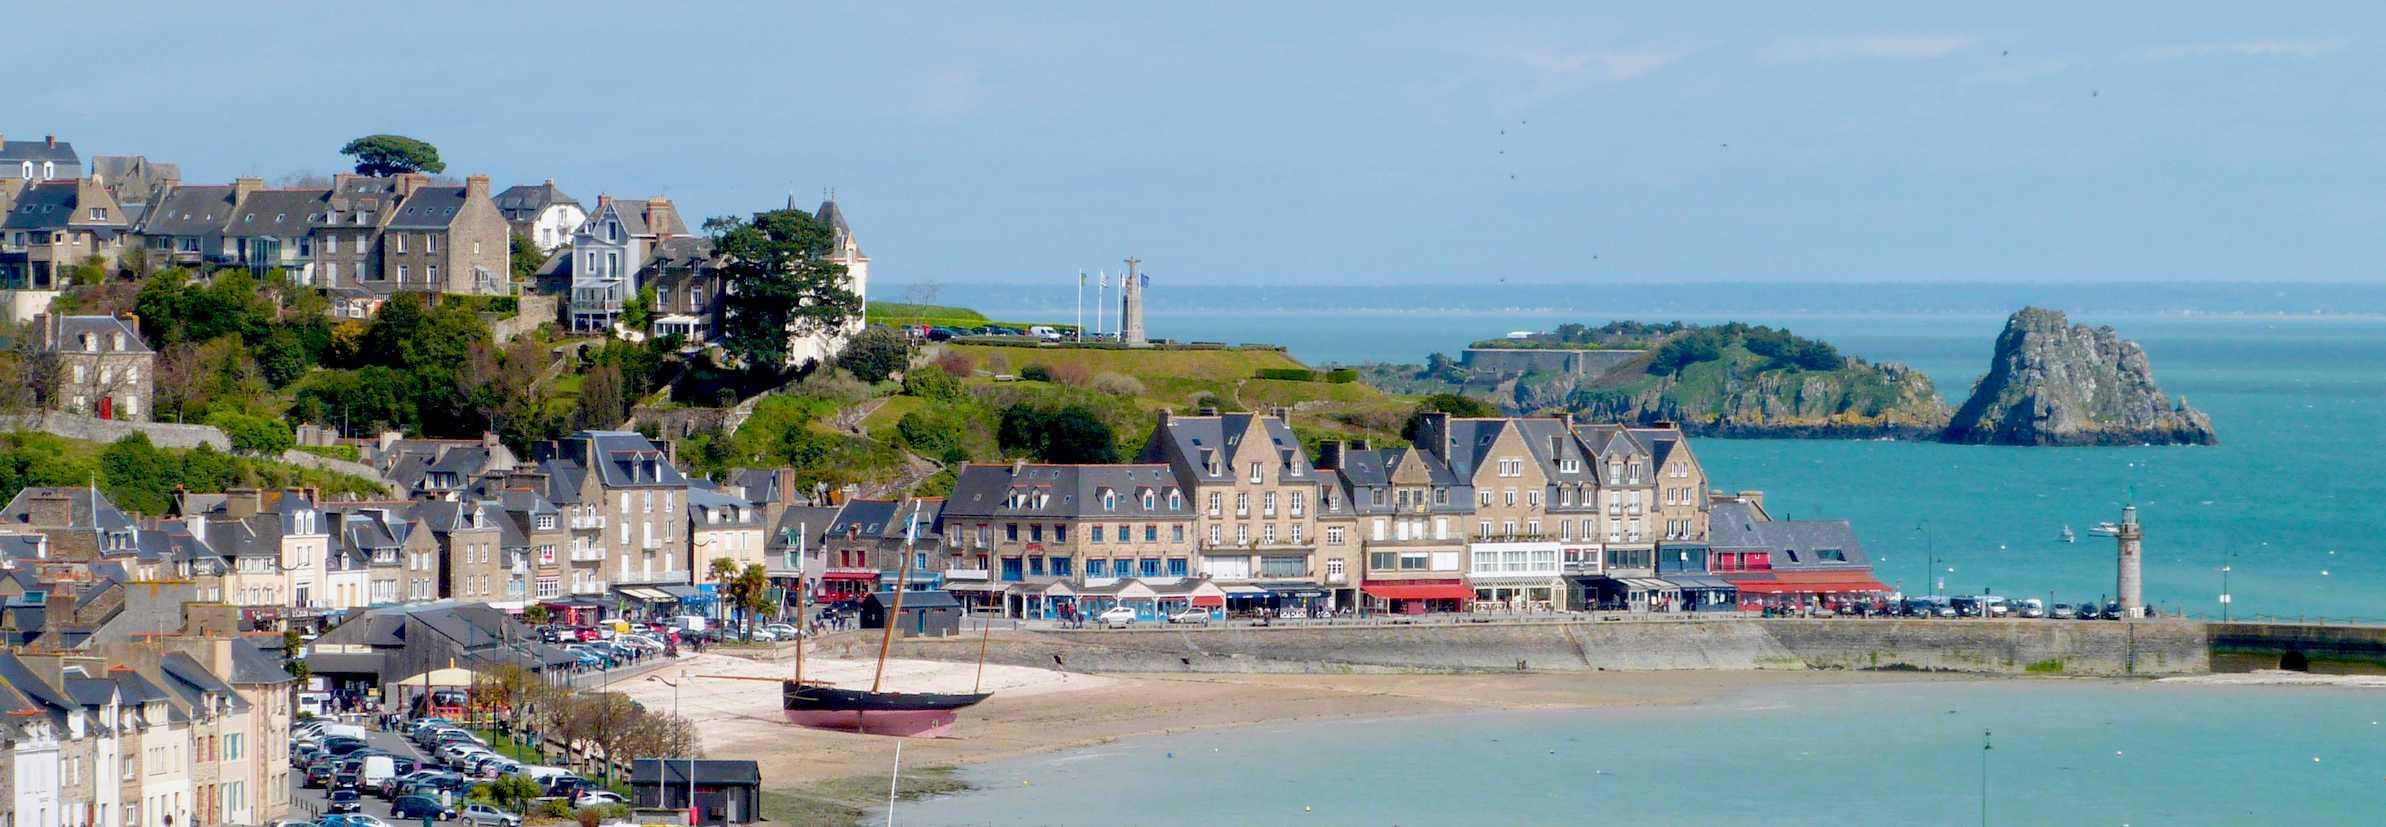 Cancale en Bretagne